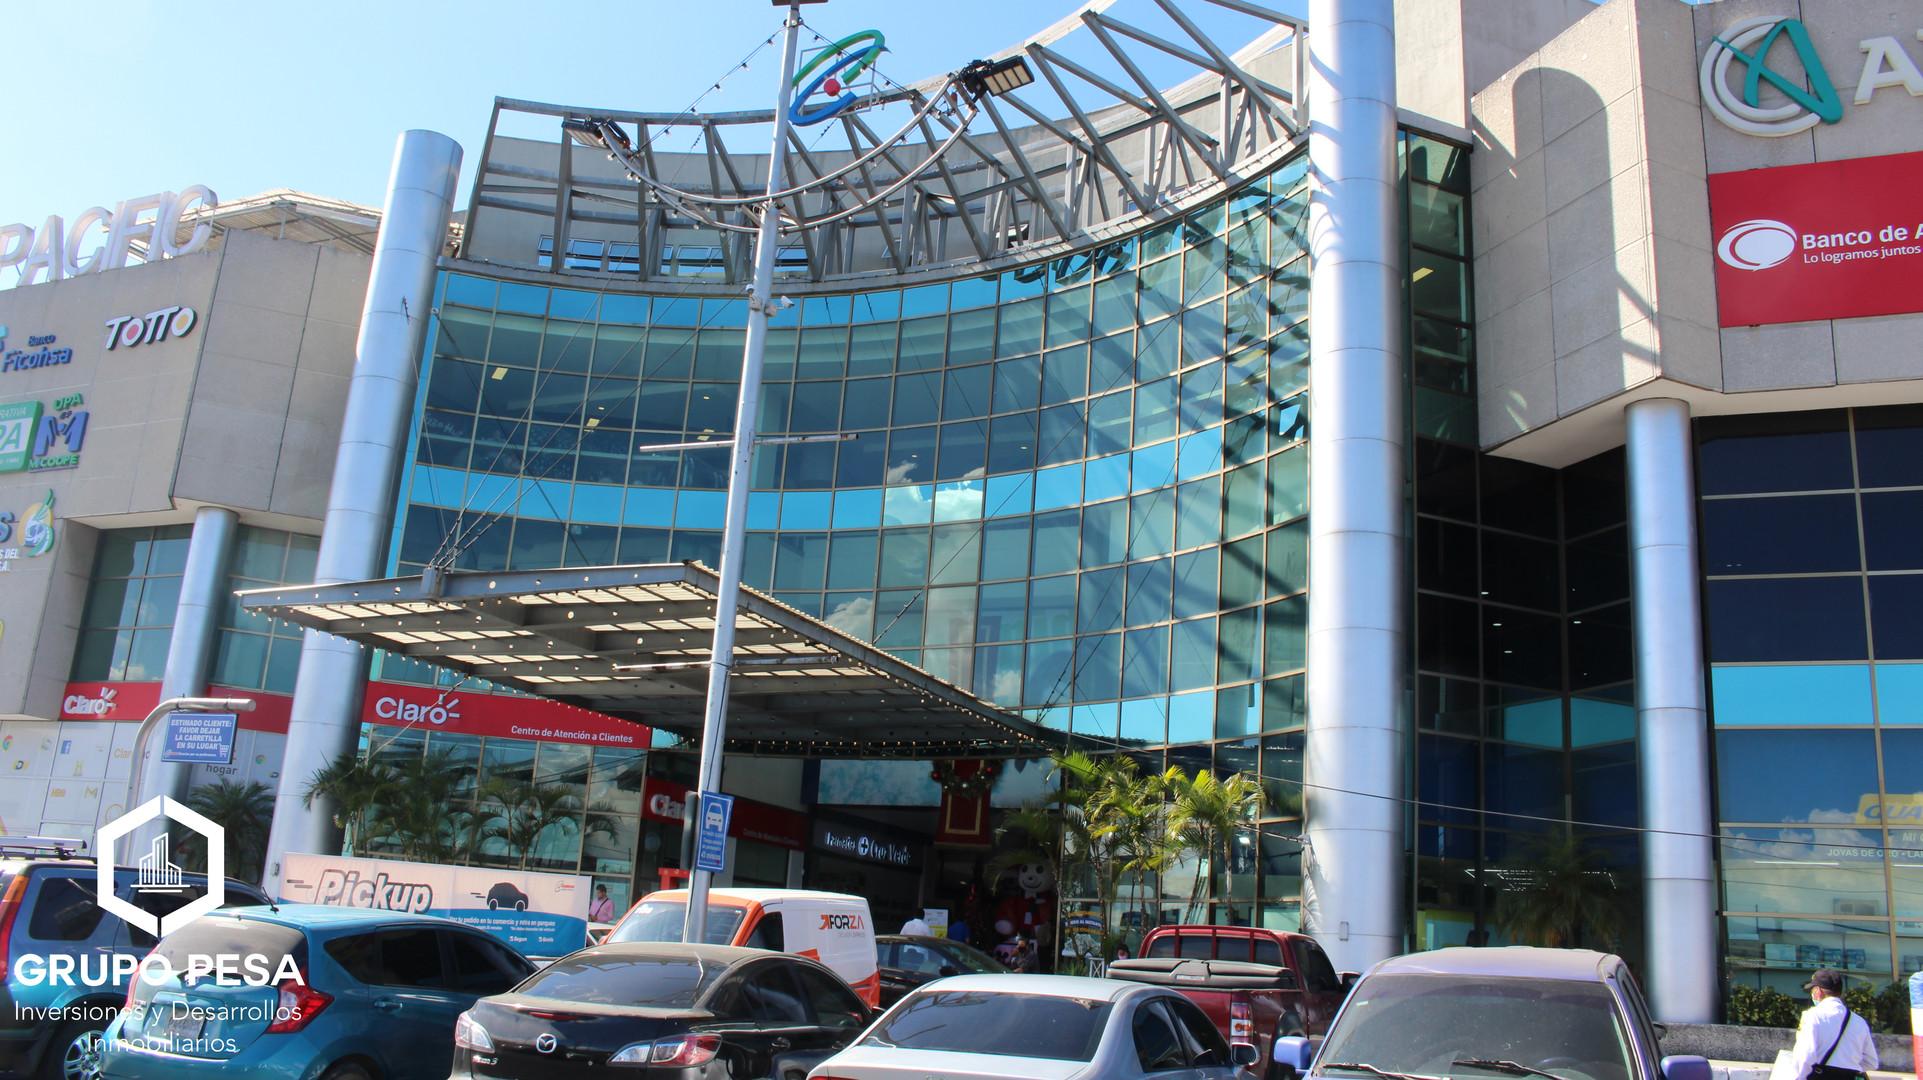 Local Comercial | C.C. Pacific Center, Zona 11 | Cd. de Guatemala